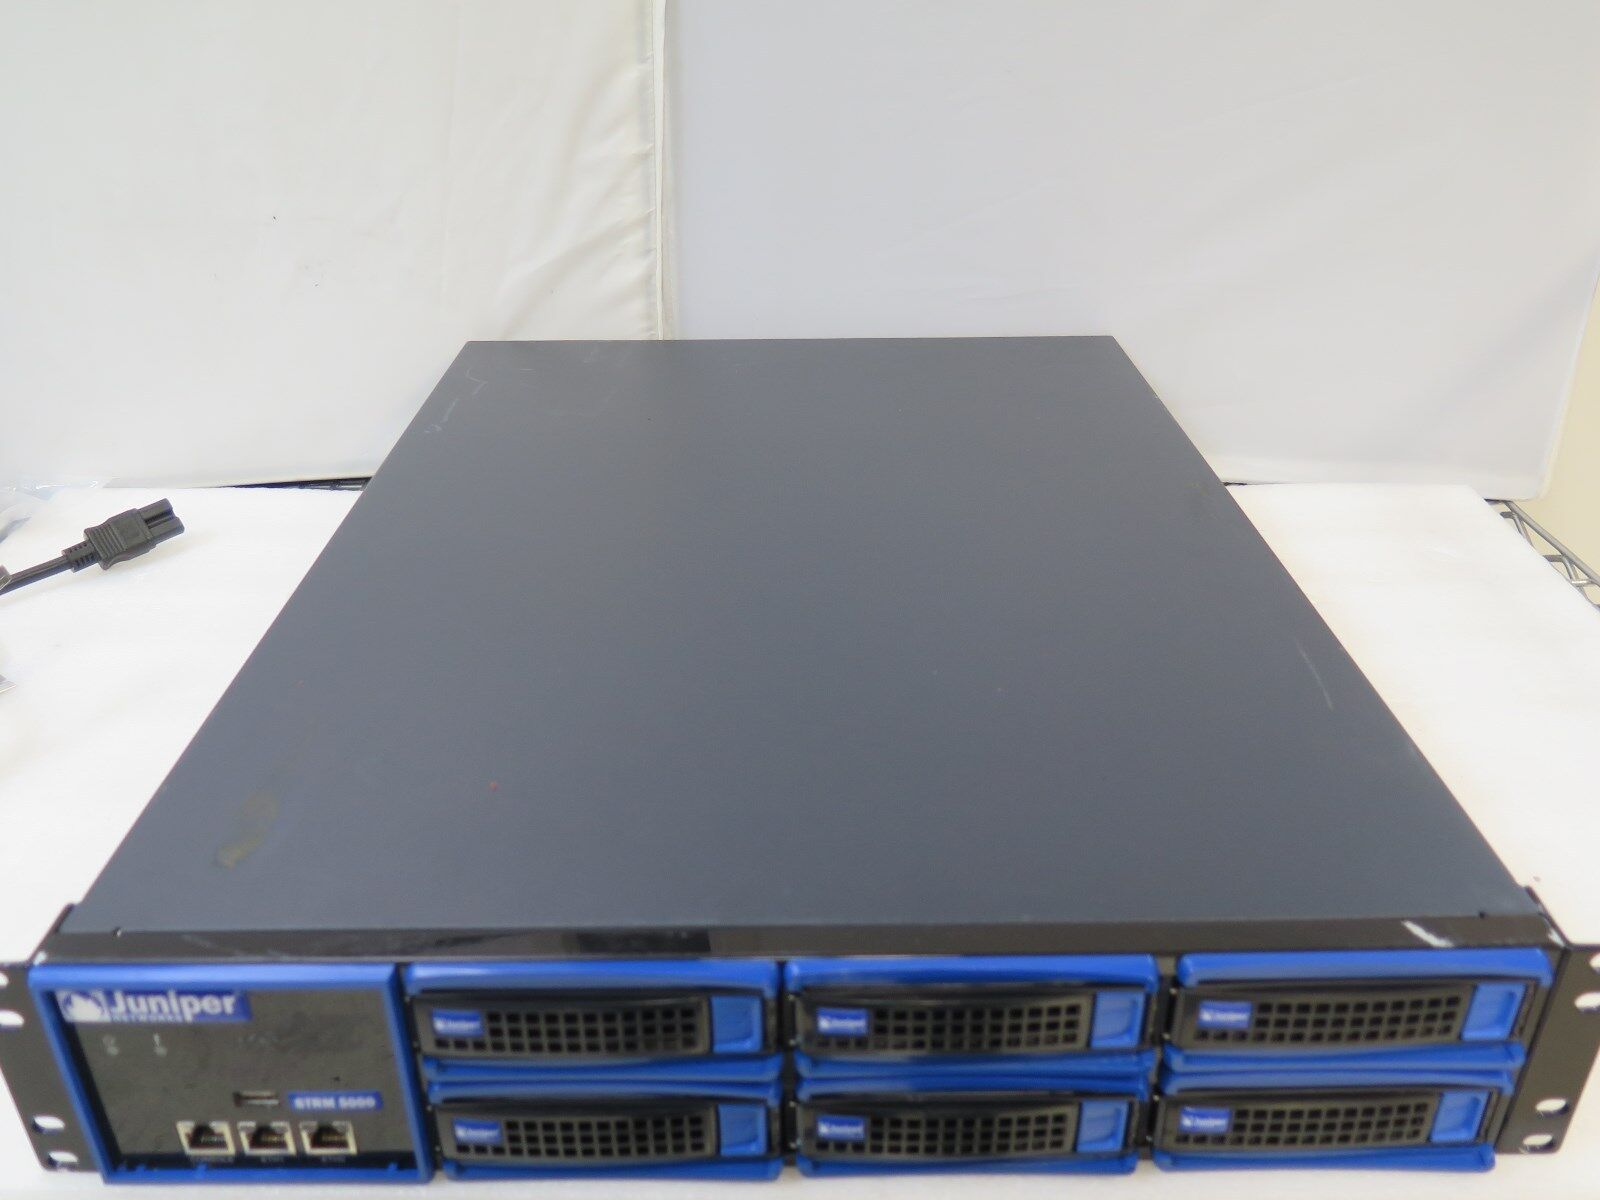 Juniper STRM5000 JNHE2 Security Threat Response Management 6x 500GB HD